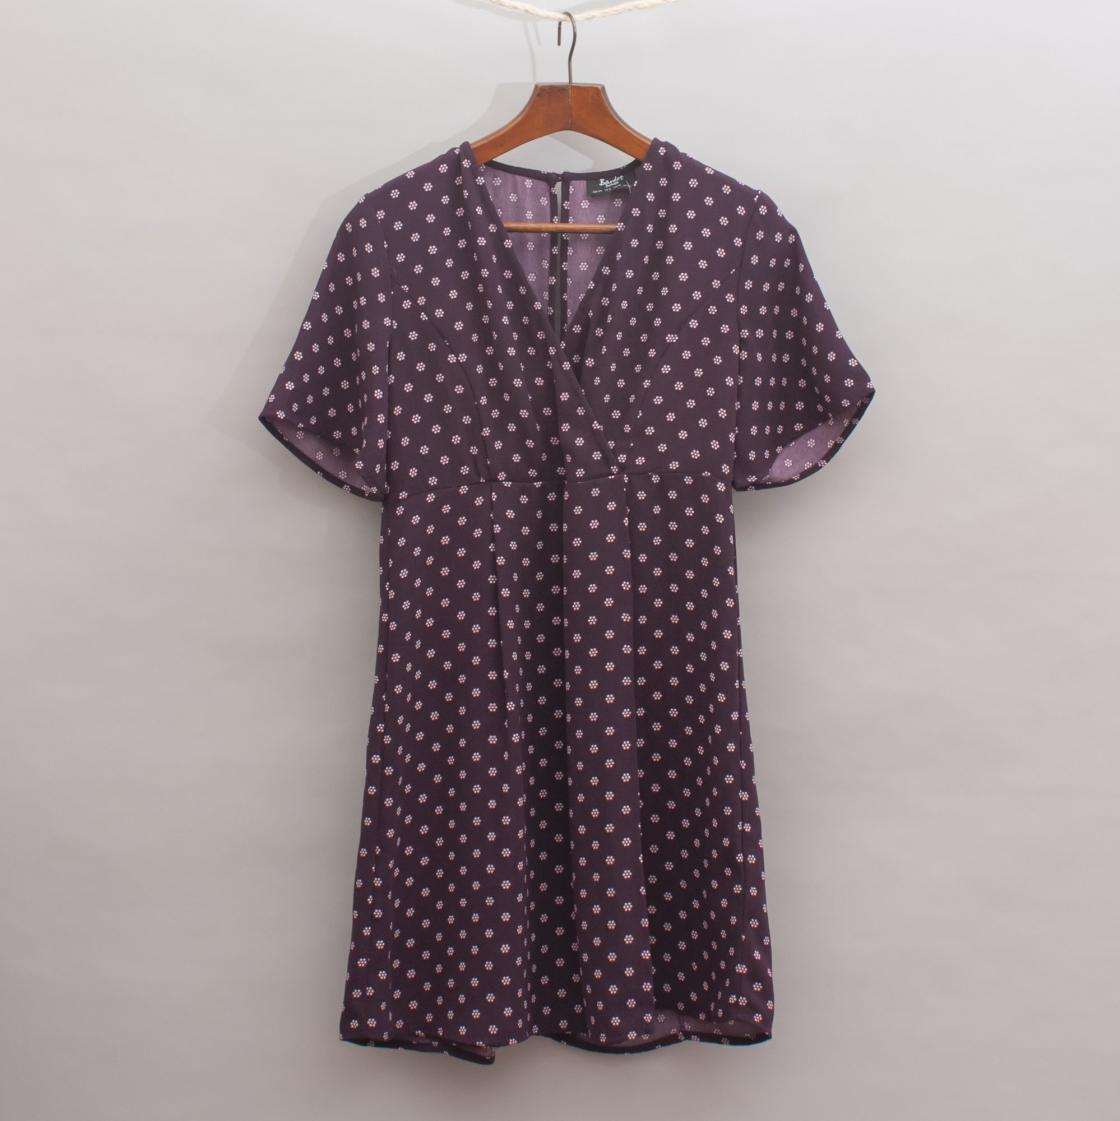 Bardot Patterned Dress